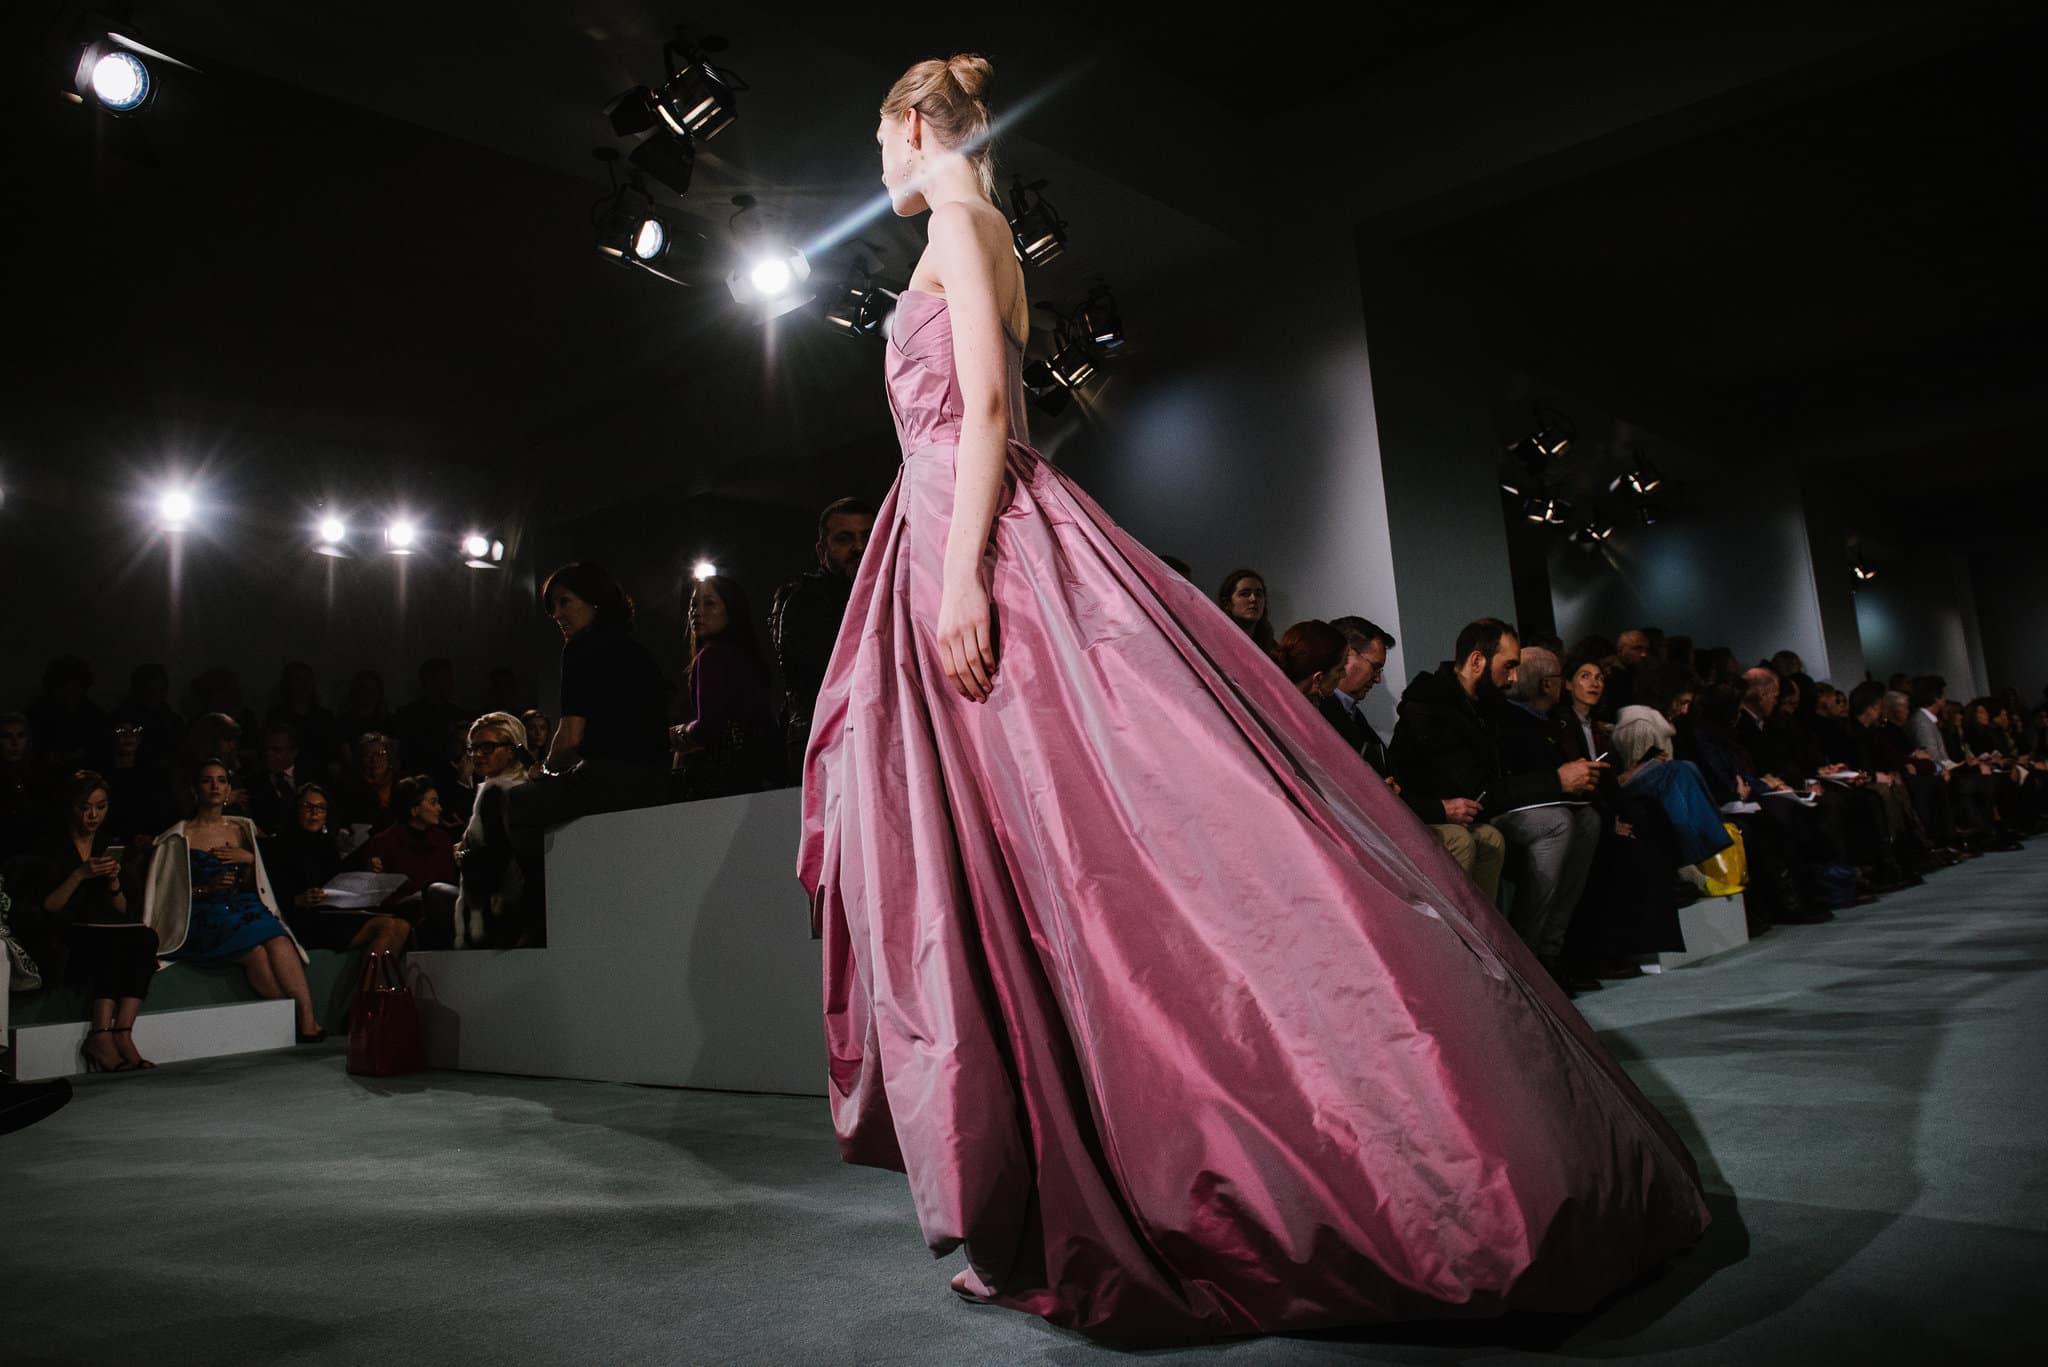 pink-taffeta-strapless-oscar-de-la-renta-dress-formal-gown-cococozy-nyt